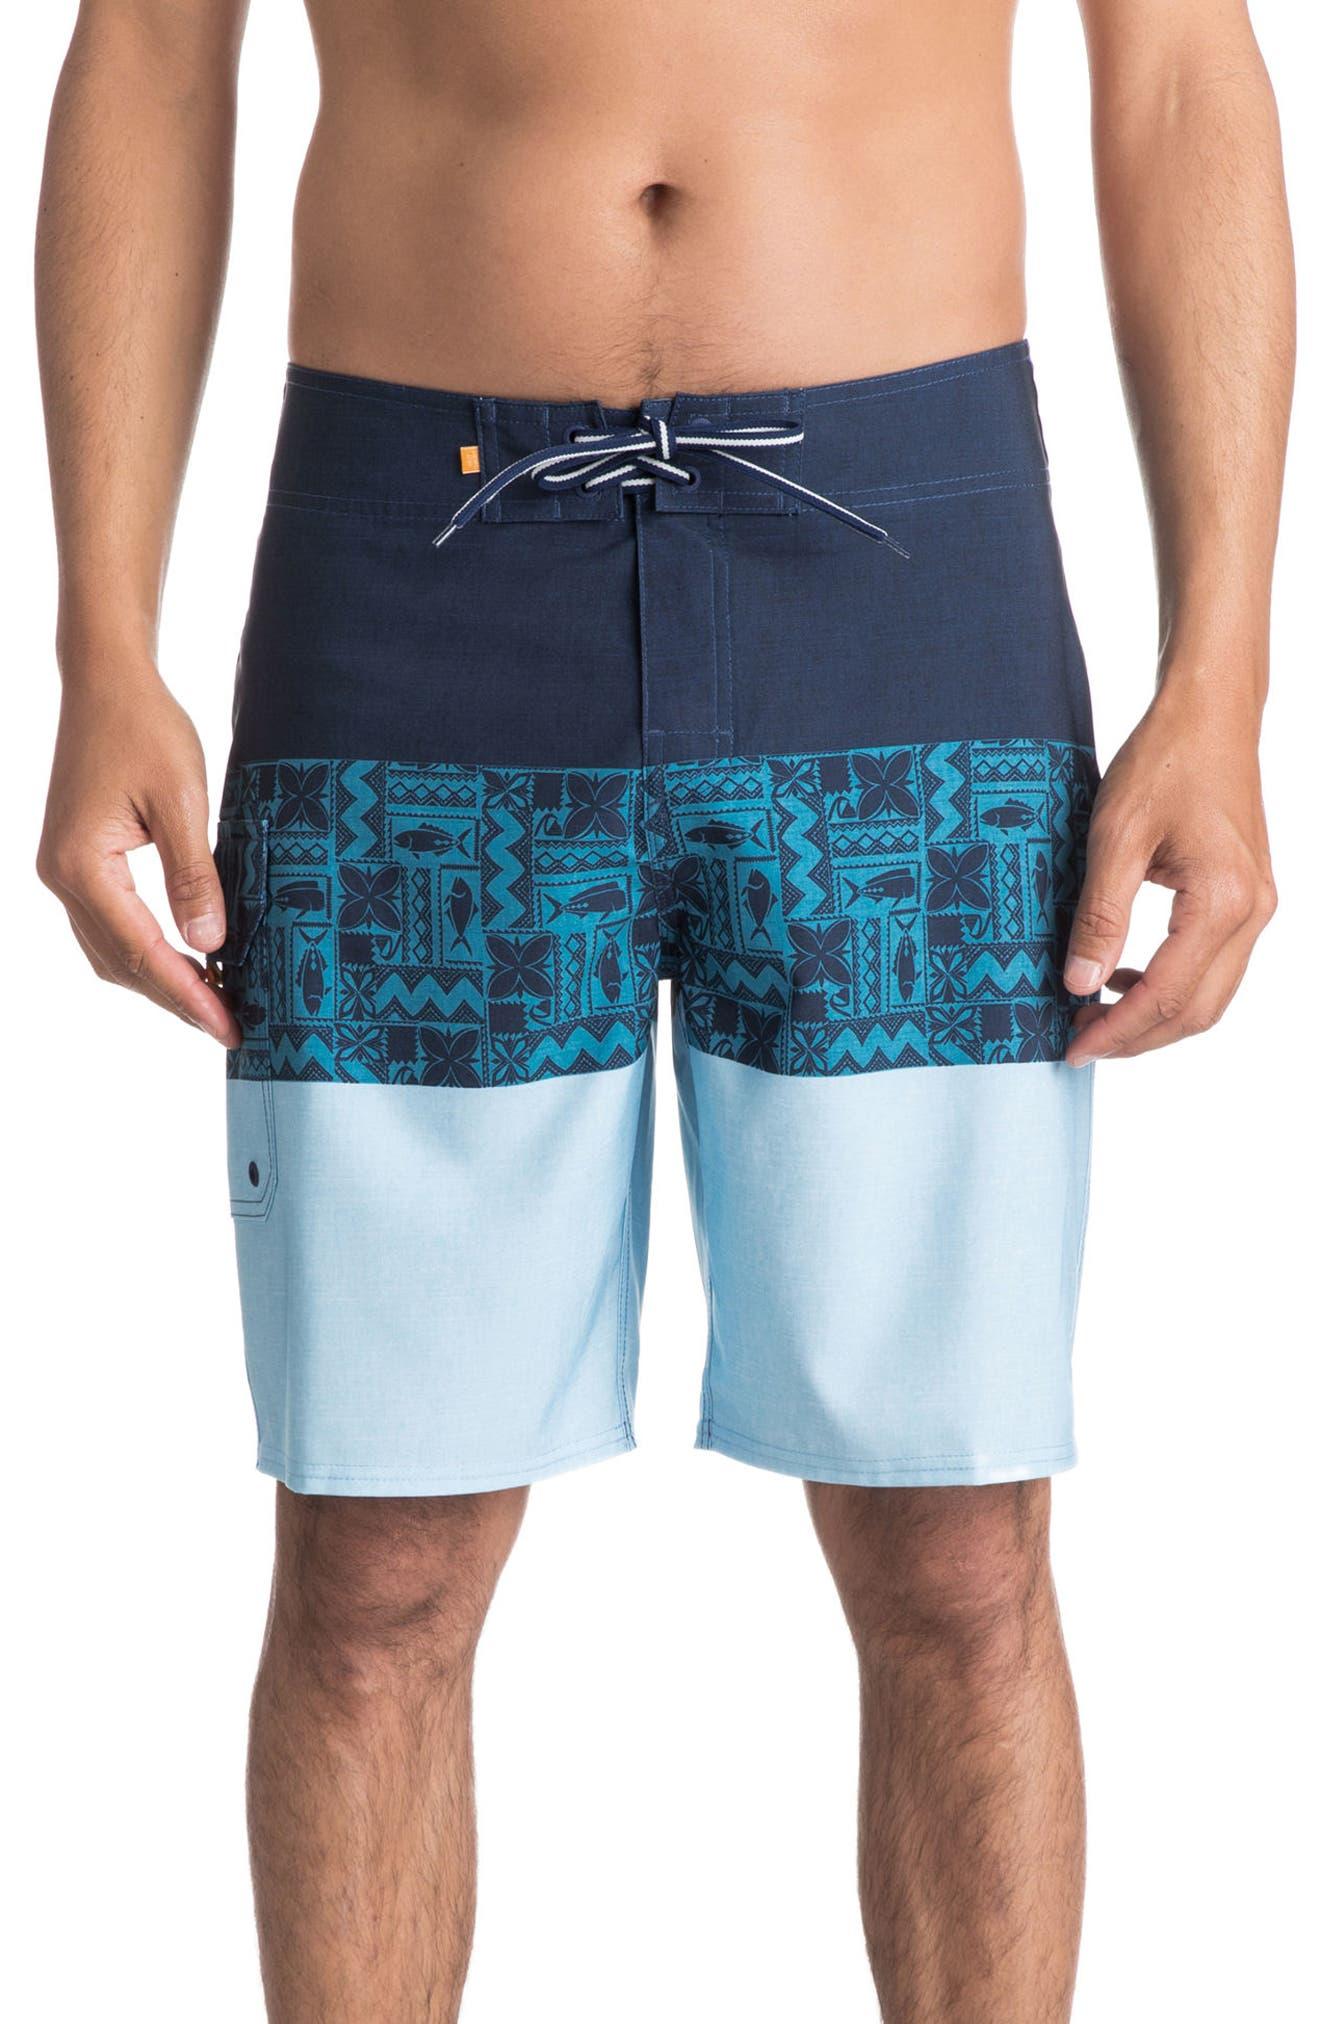 Quiksilver Waterman Collection Fairway Triblock Board Shorts